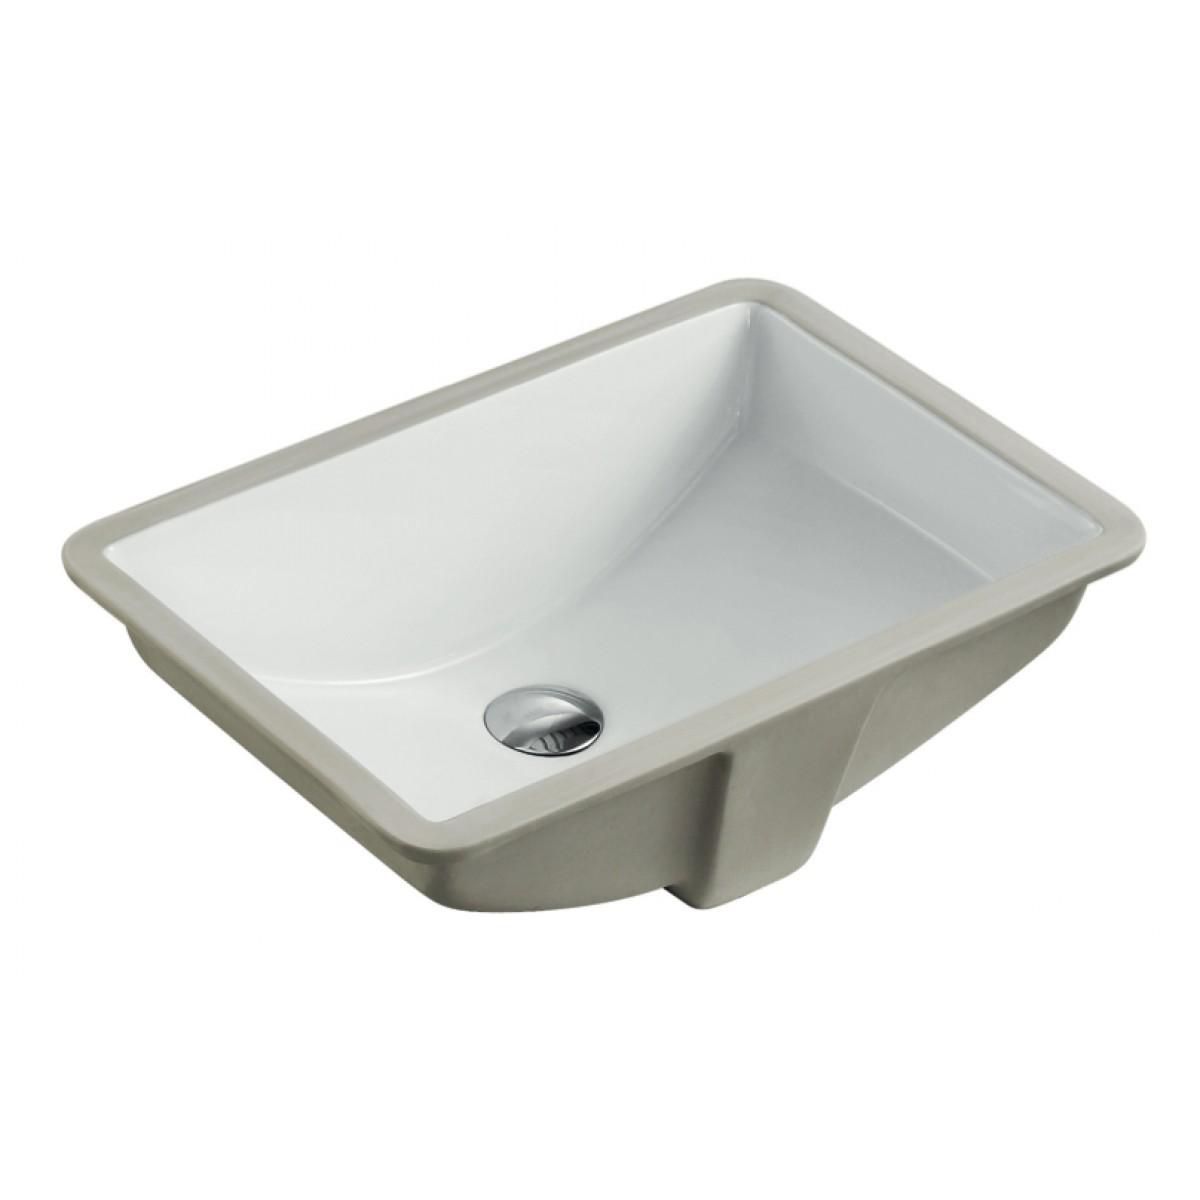 Rectangular white biscuit porcelain ceramic vanity - White bathroom vanity with vessel sink ...